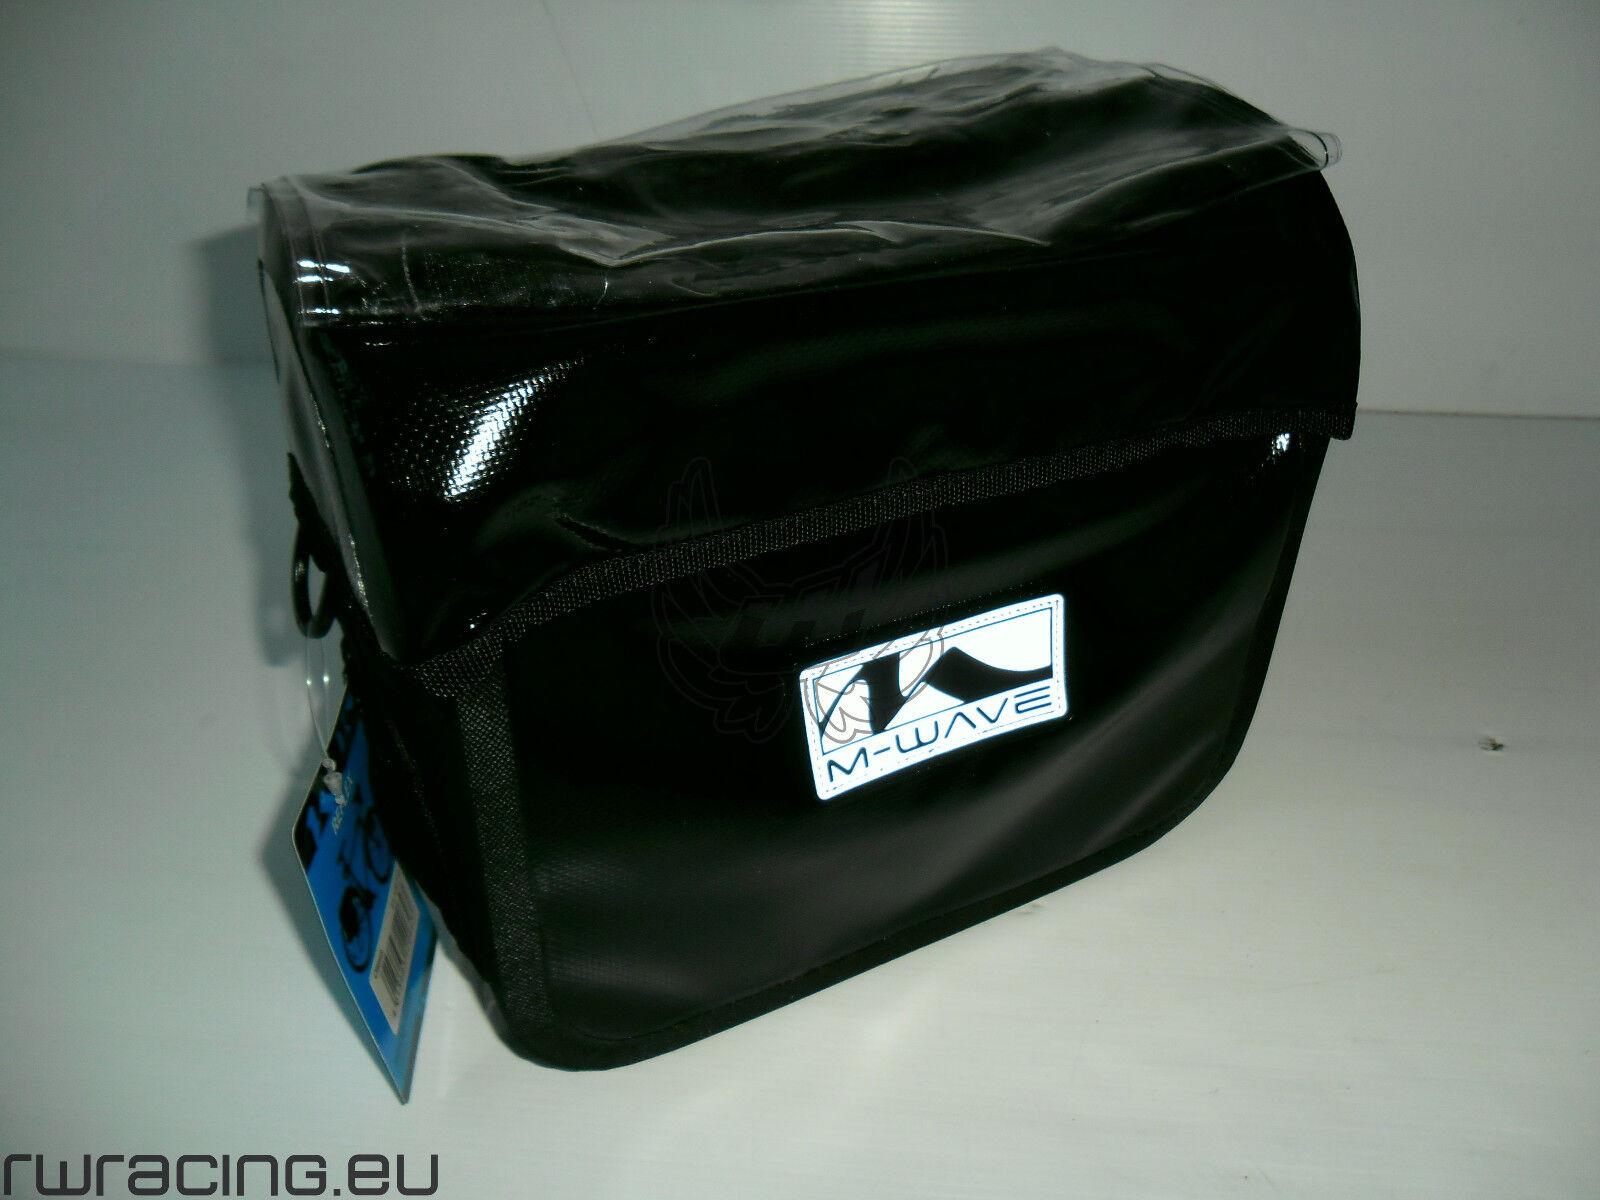 Borsa bici manubrio antipioggia 100% M-wave   bicycle handlebar bag